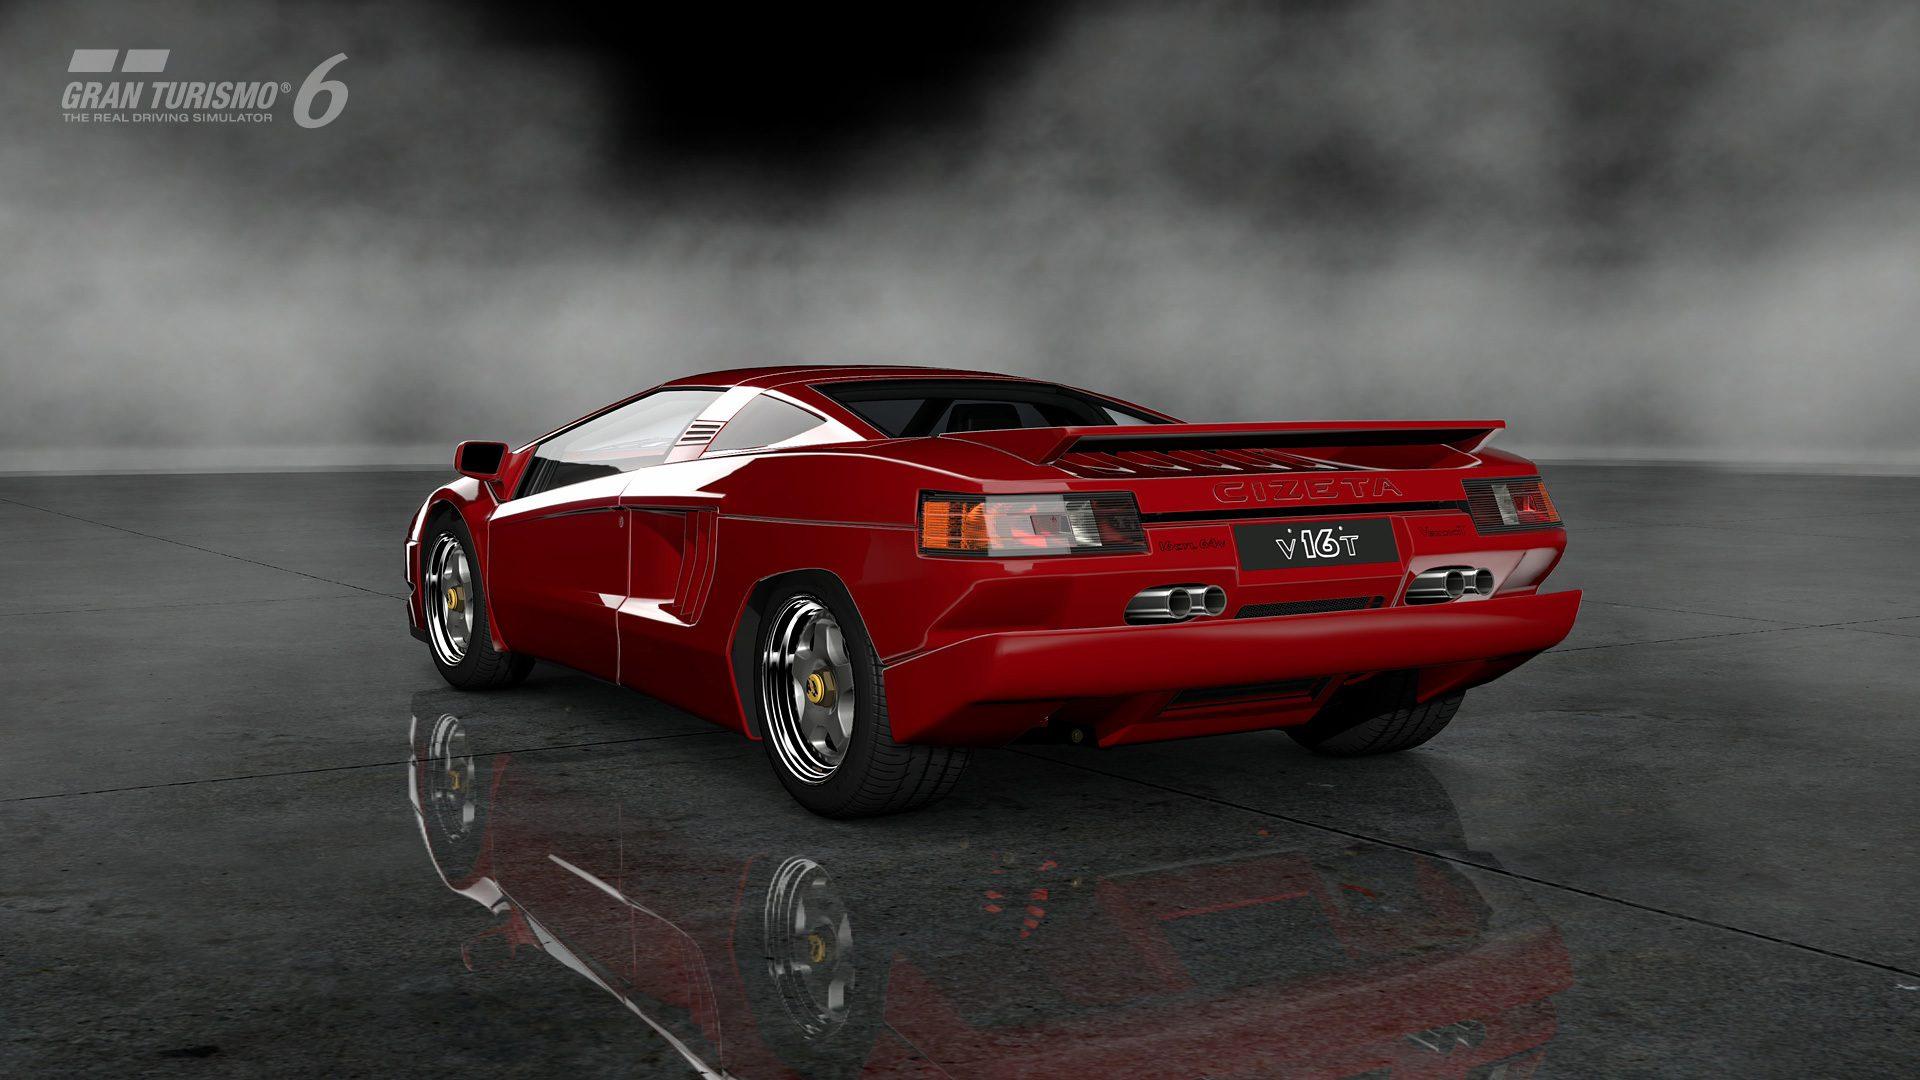 Gt6 Screenshot Blowout Pagani Huayra Brands Hatch New